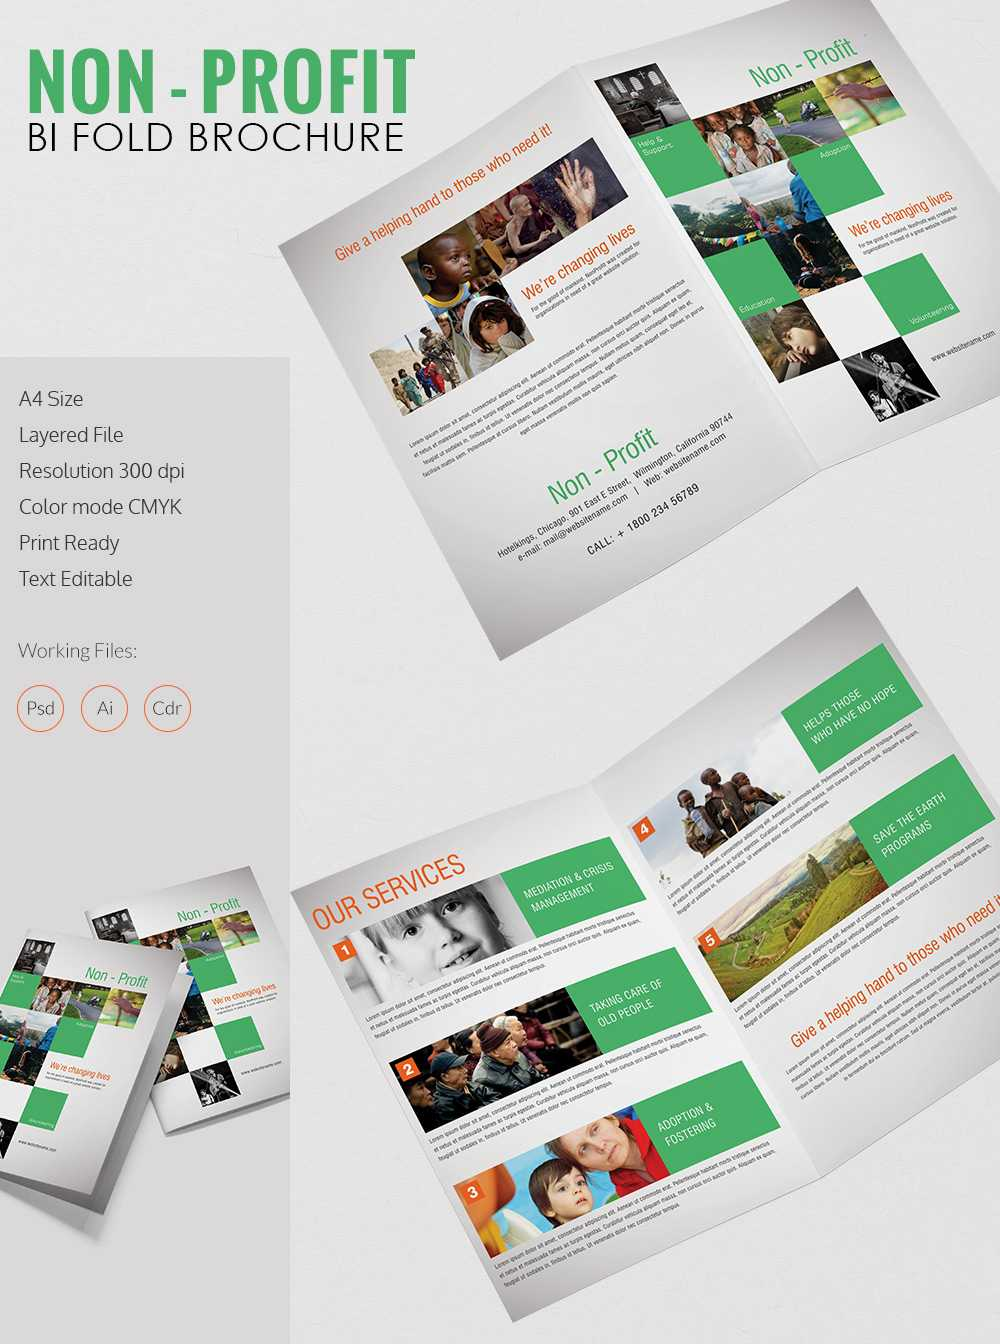 Bi Fold Brochure Template A4 Psd Free Download Illustrator within Two Fold Brochure Template Psd